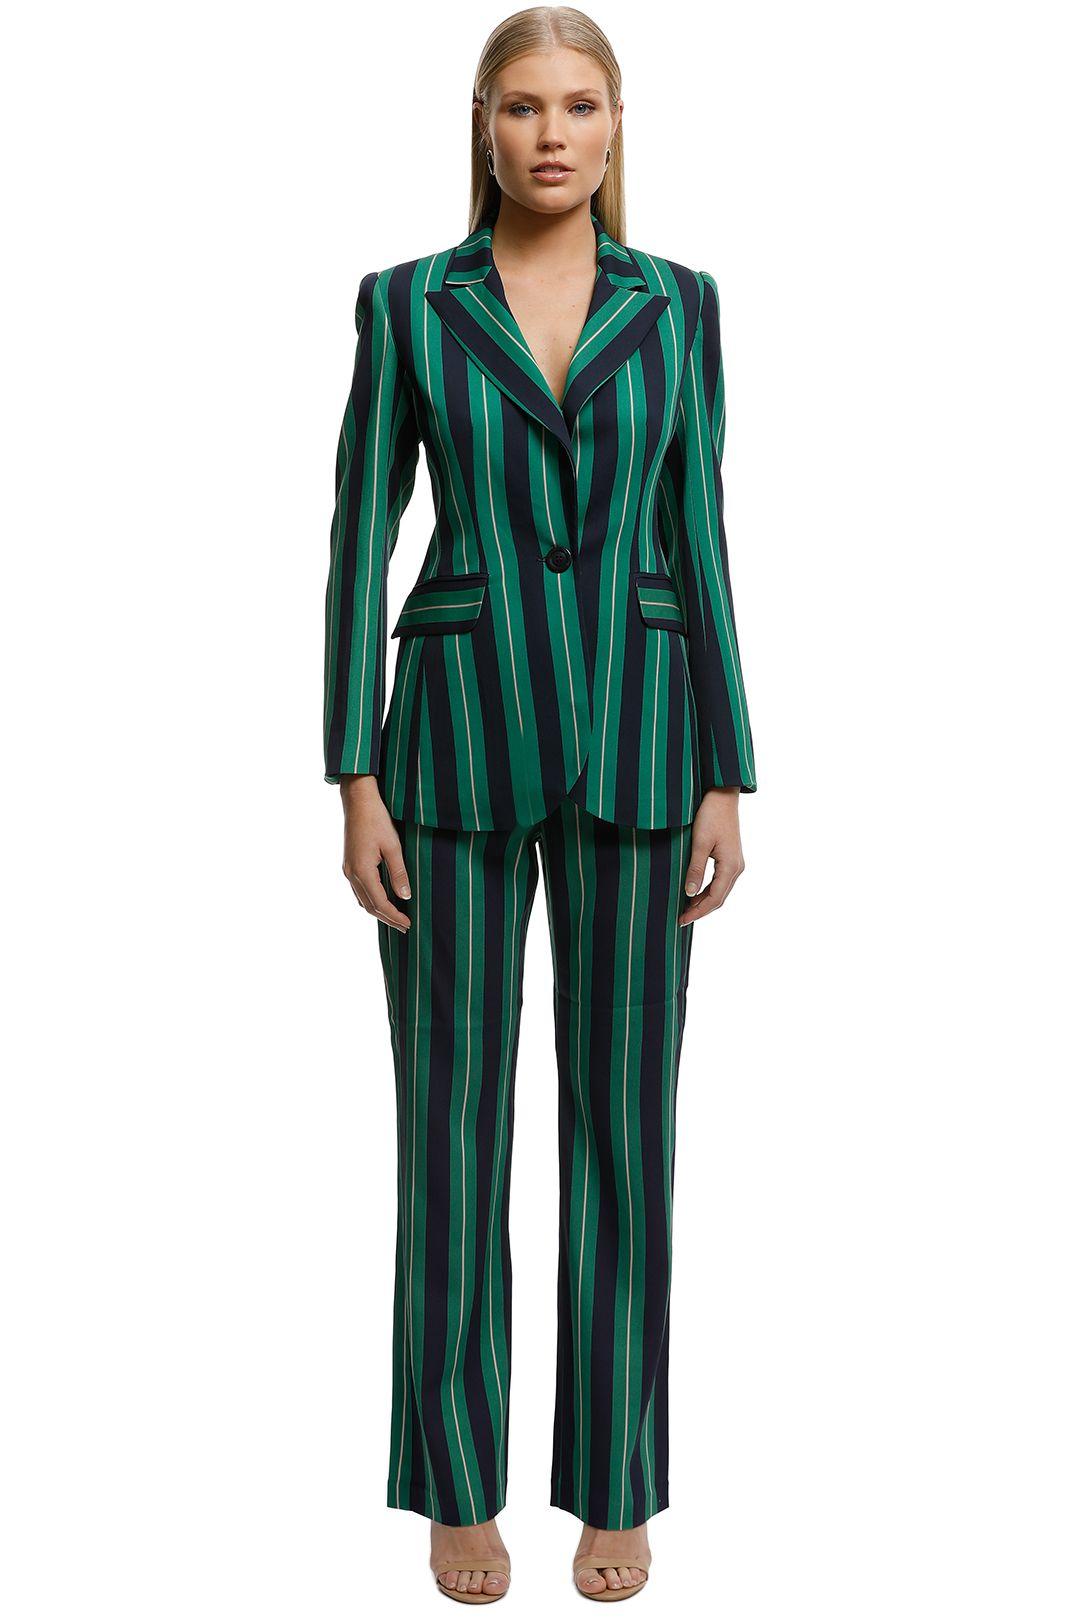 Moss-and-Spy-Gatsby-Blazer-Green-Stripe-Front